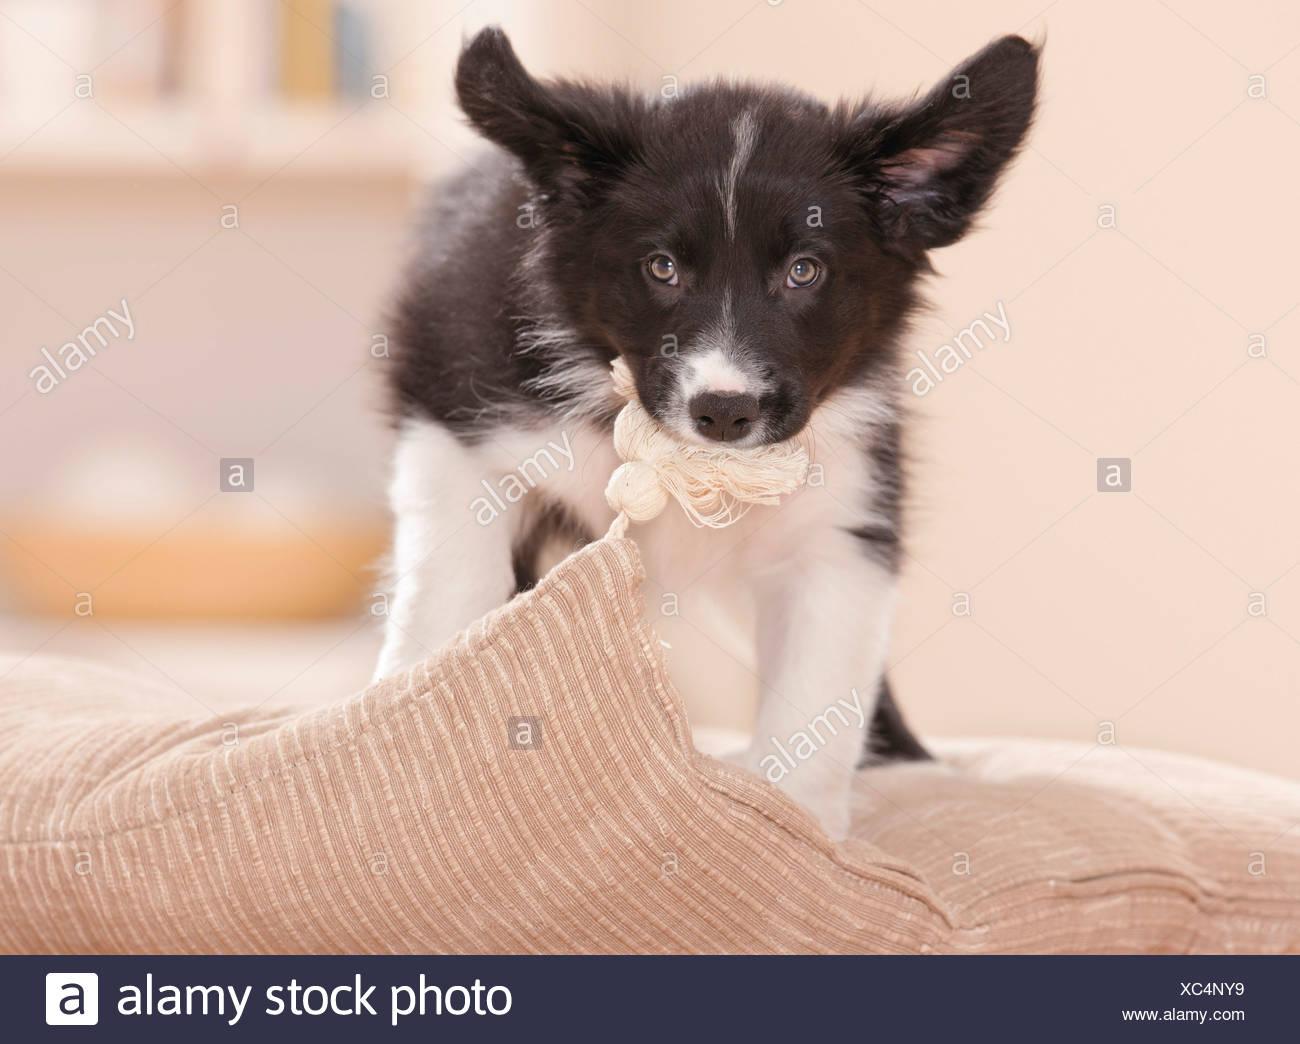 Bad Habit: Border Collie Puppy Biting Pillow